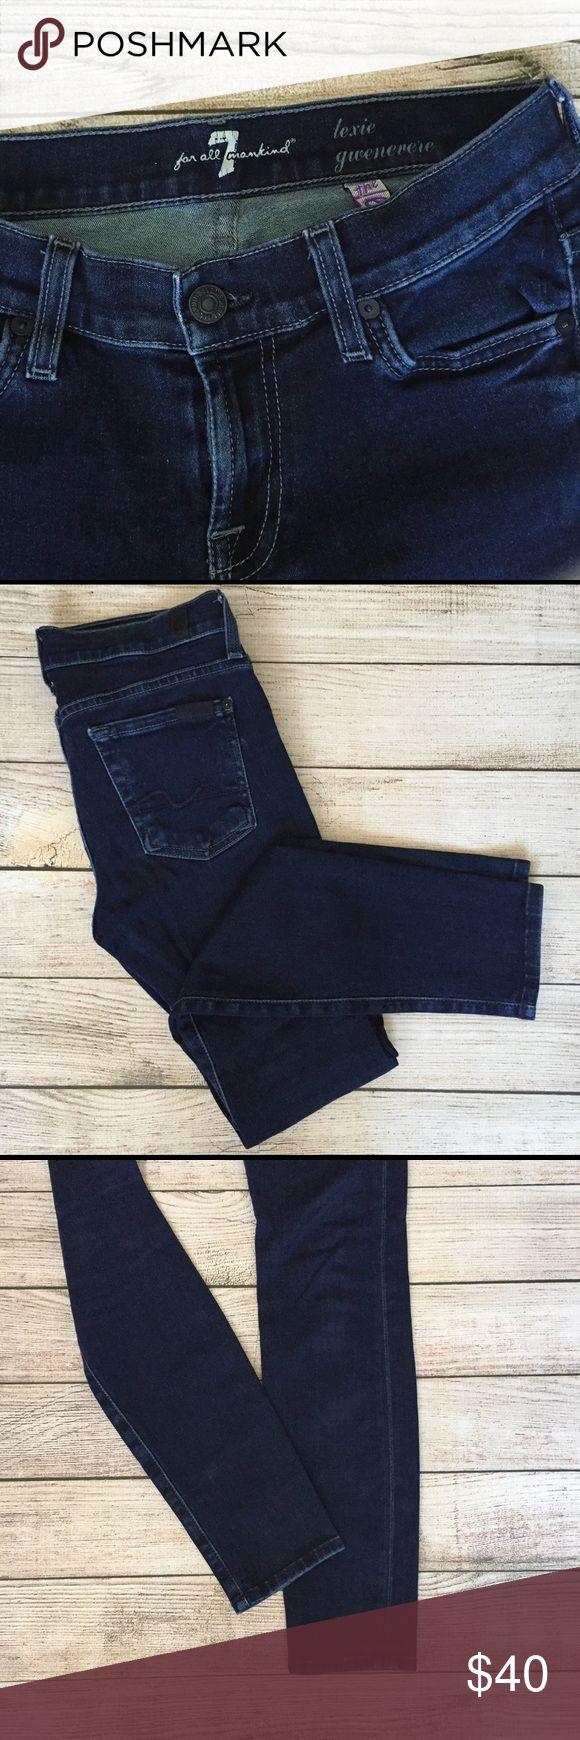 1000  ideas about Petite Skinny Jeans on Pinterest | Petite jeans